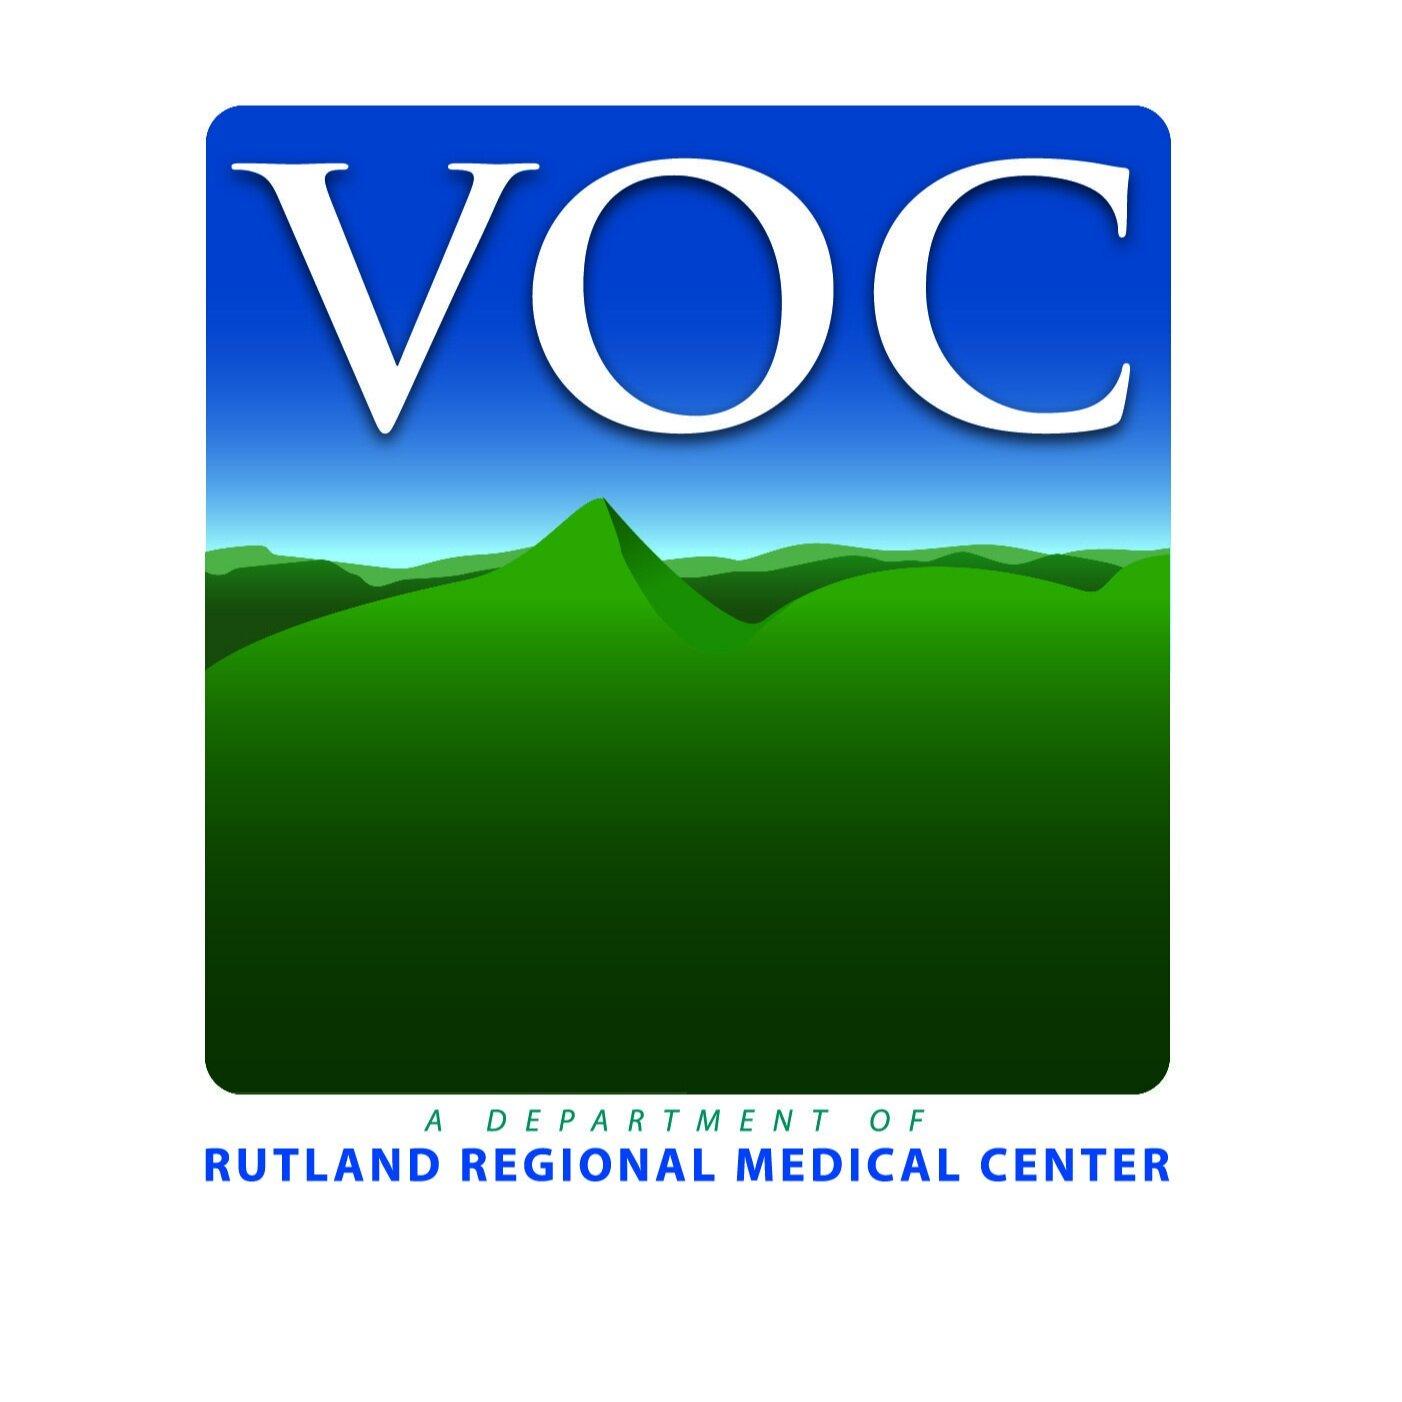 VOC_RRMC_NoName4c_rastered.jpg